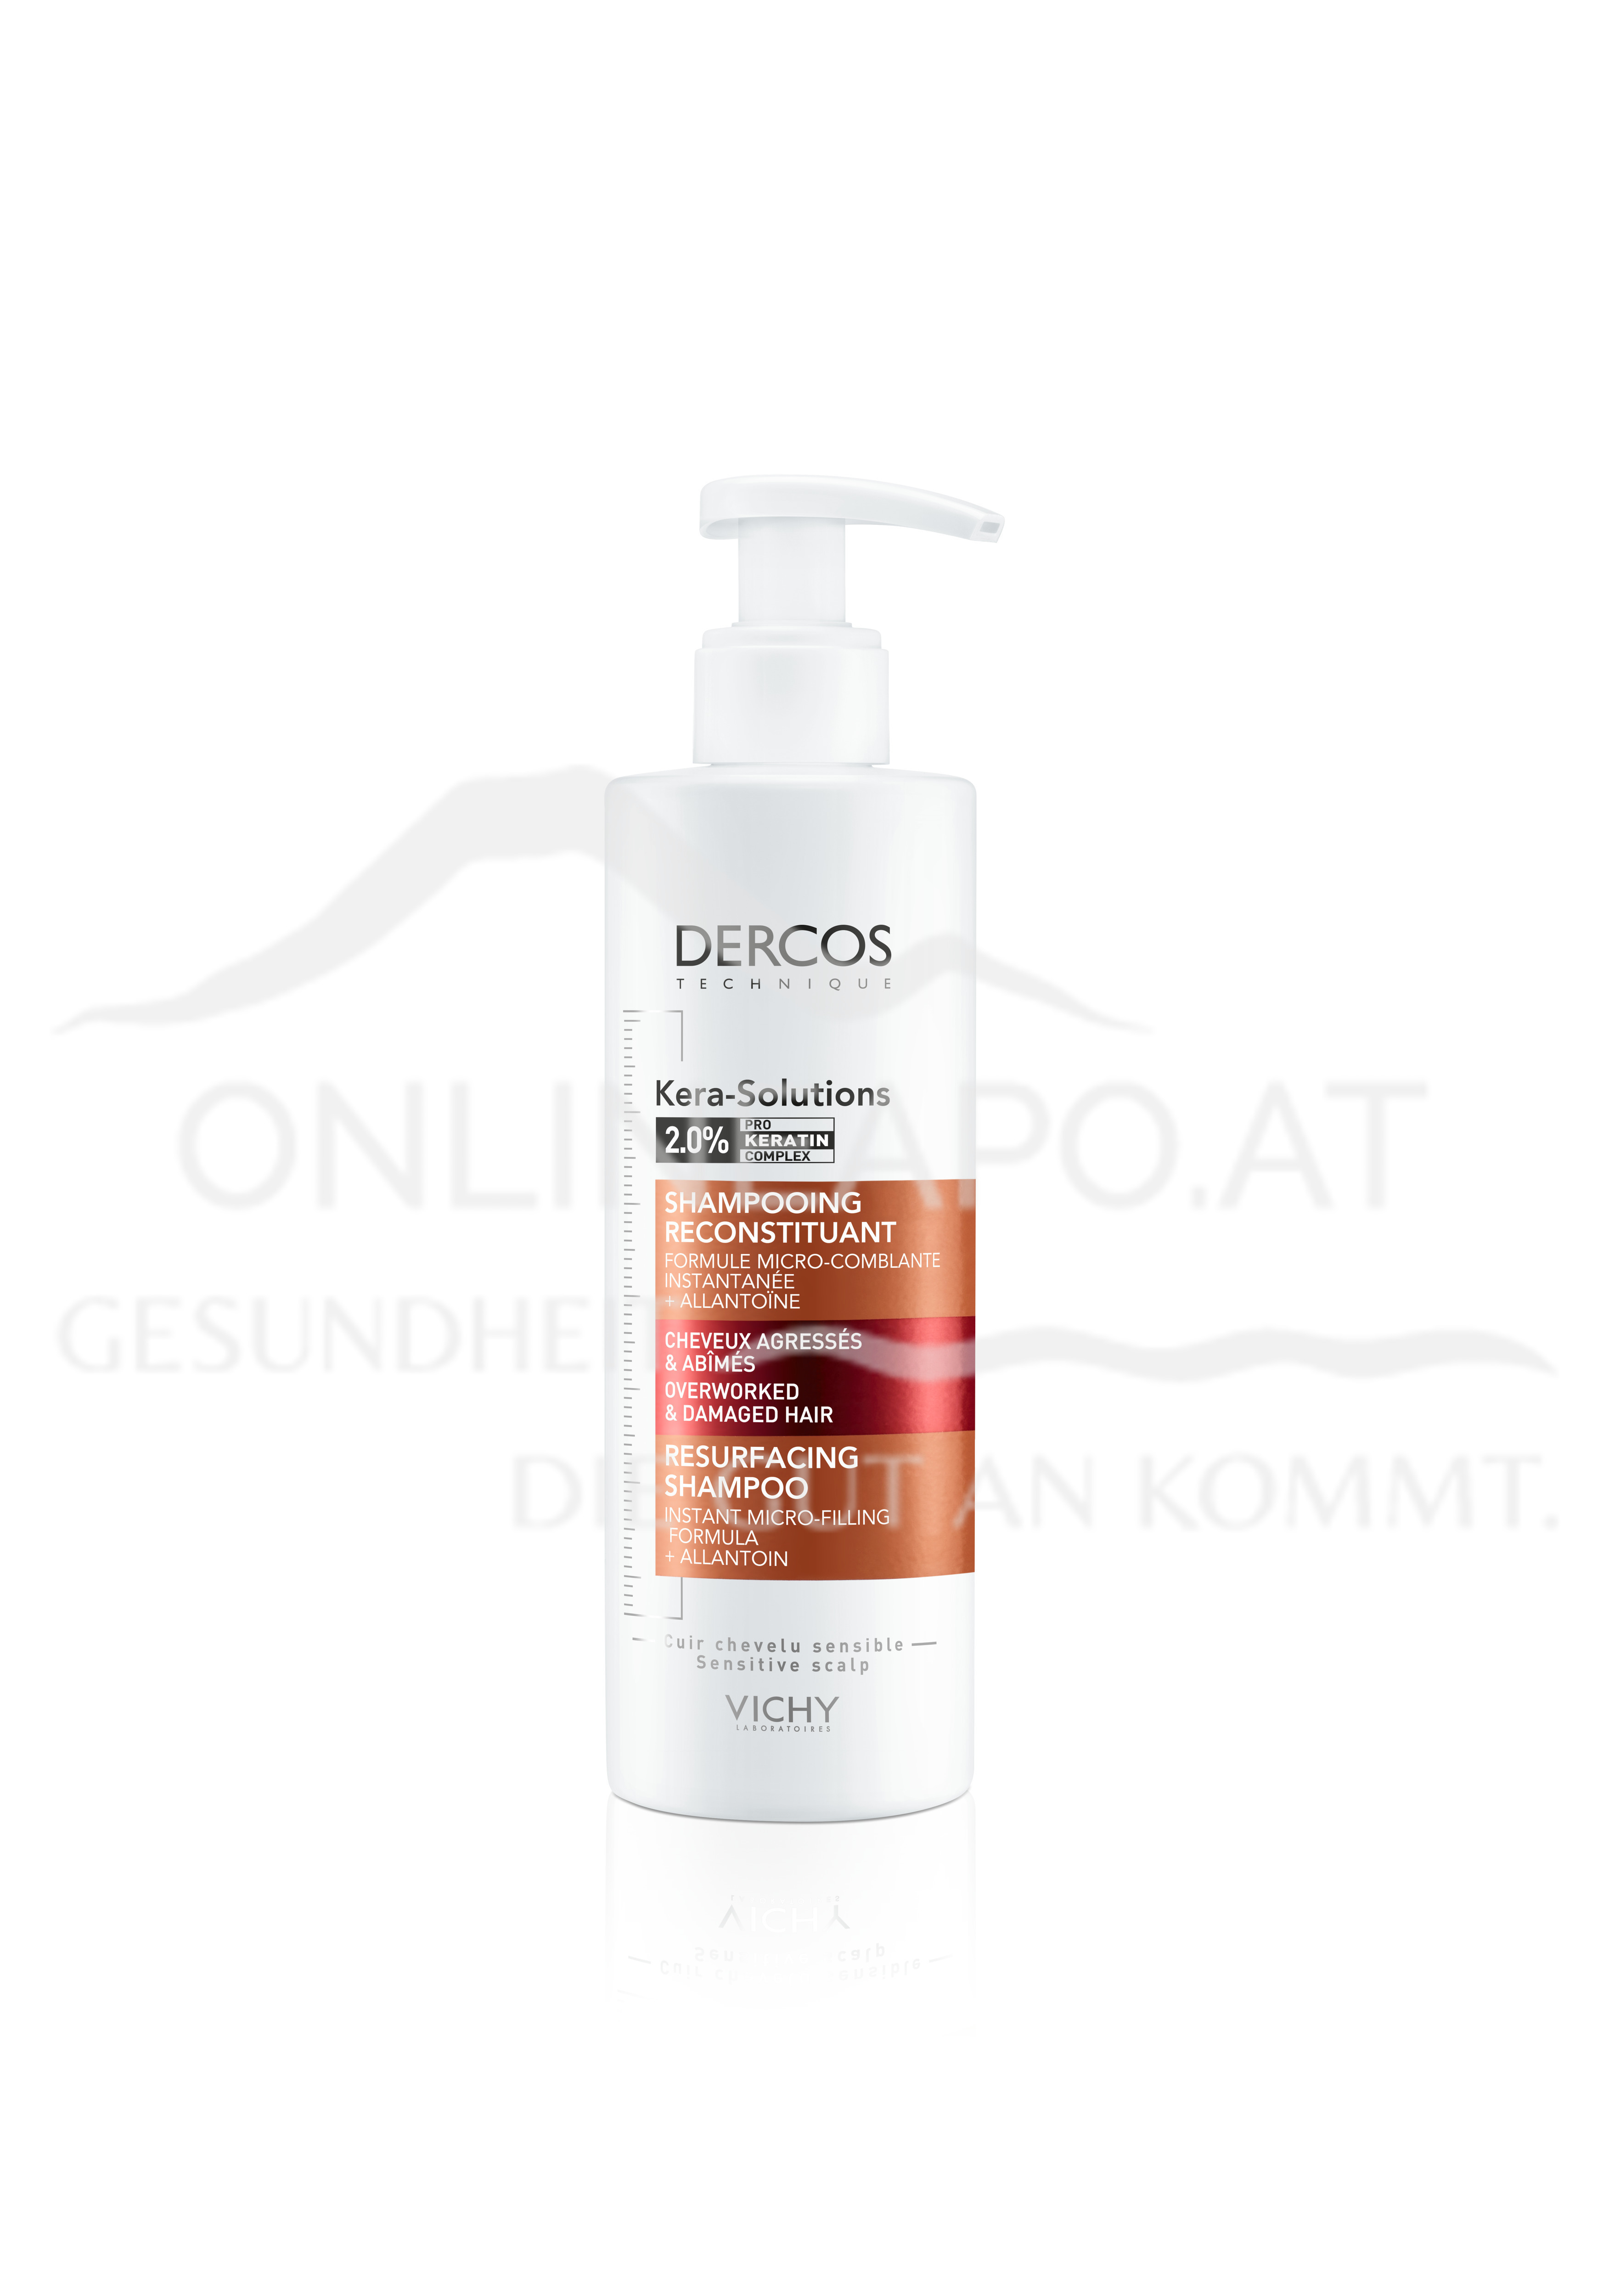 VICHY Dercos Kera Solutions Intensiv Repair Shampoo